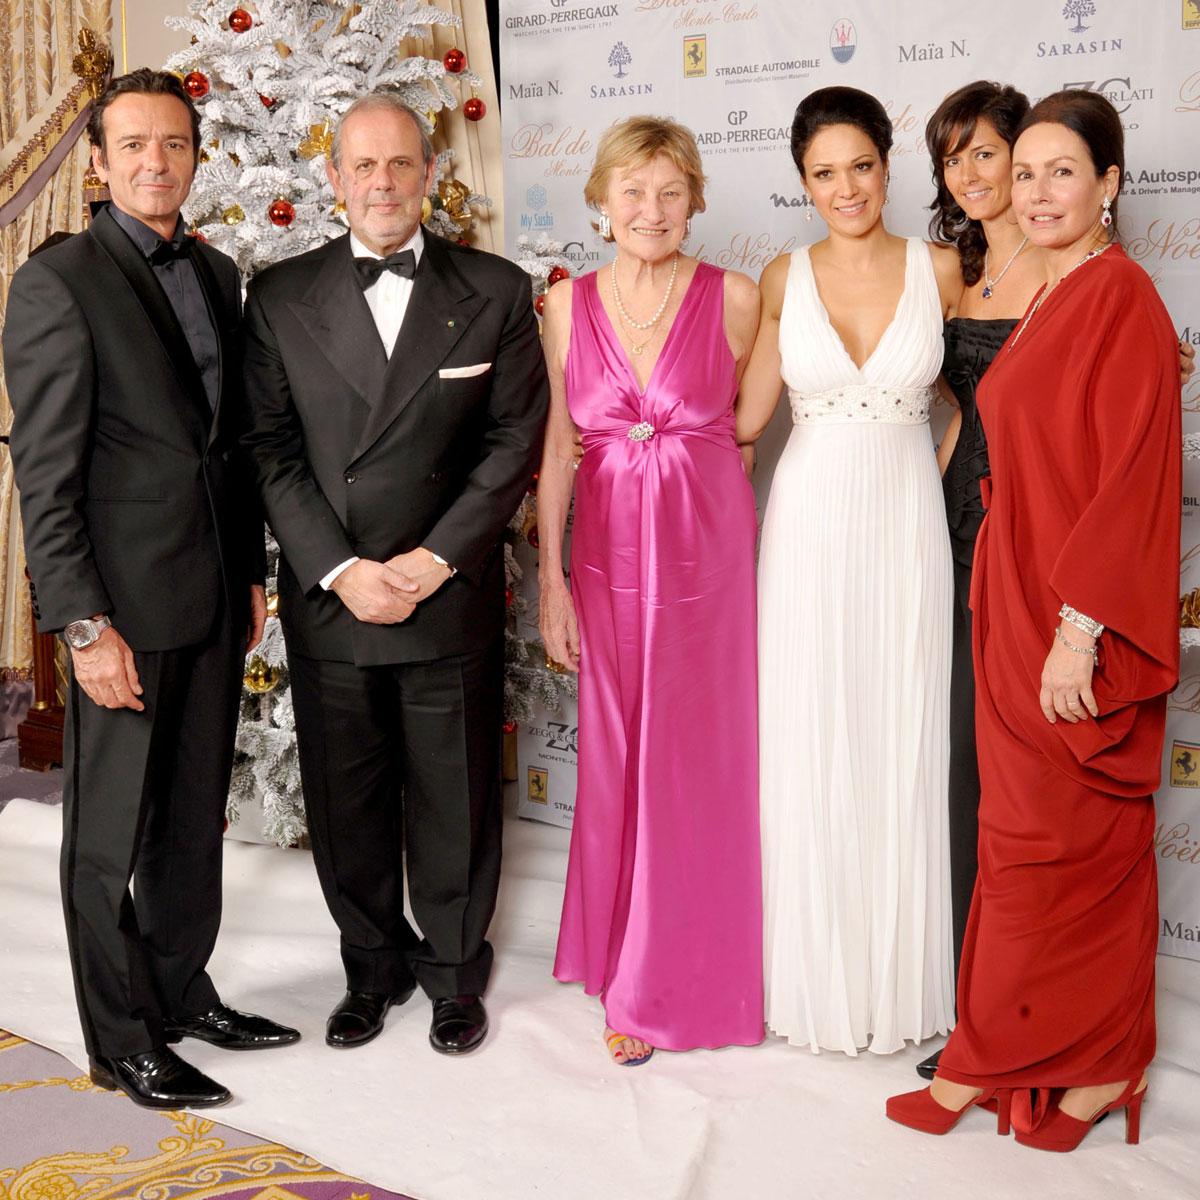 La Cote des Montres : Photo - Girard-Perregaux au Bal de Noël de Monaco